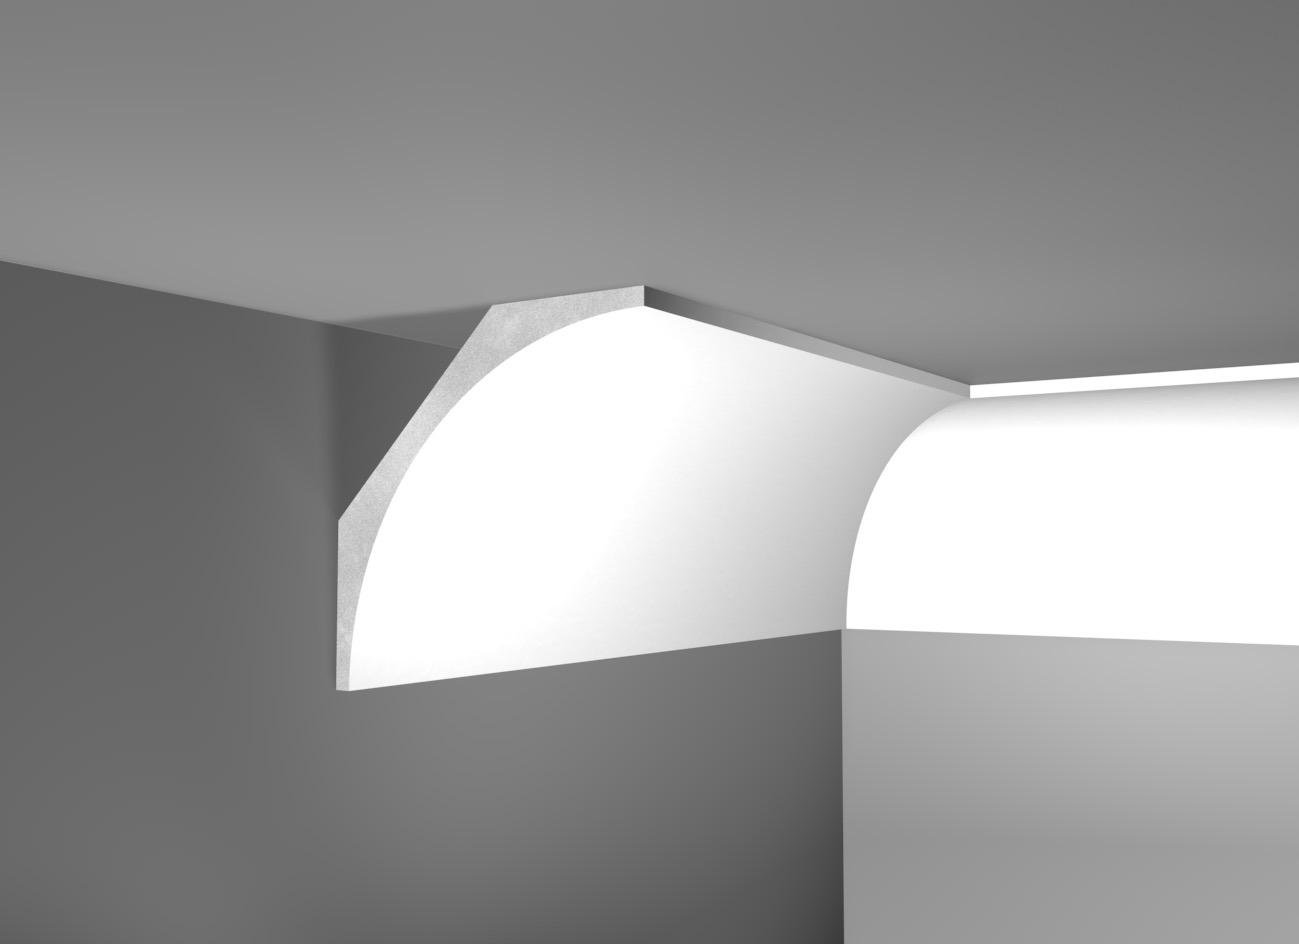 G 35 - Cornice in polistirene gessato bianco - Decorget - Ital Decori - Image 0